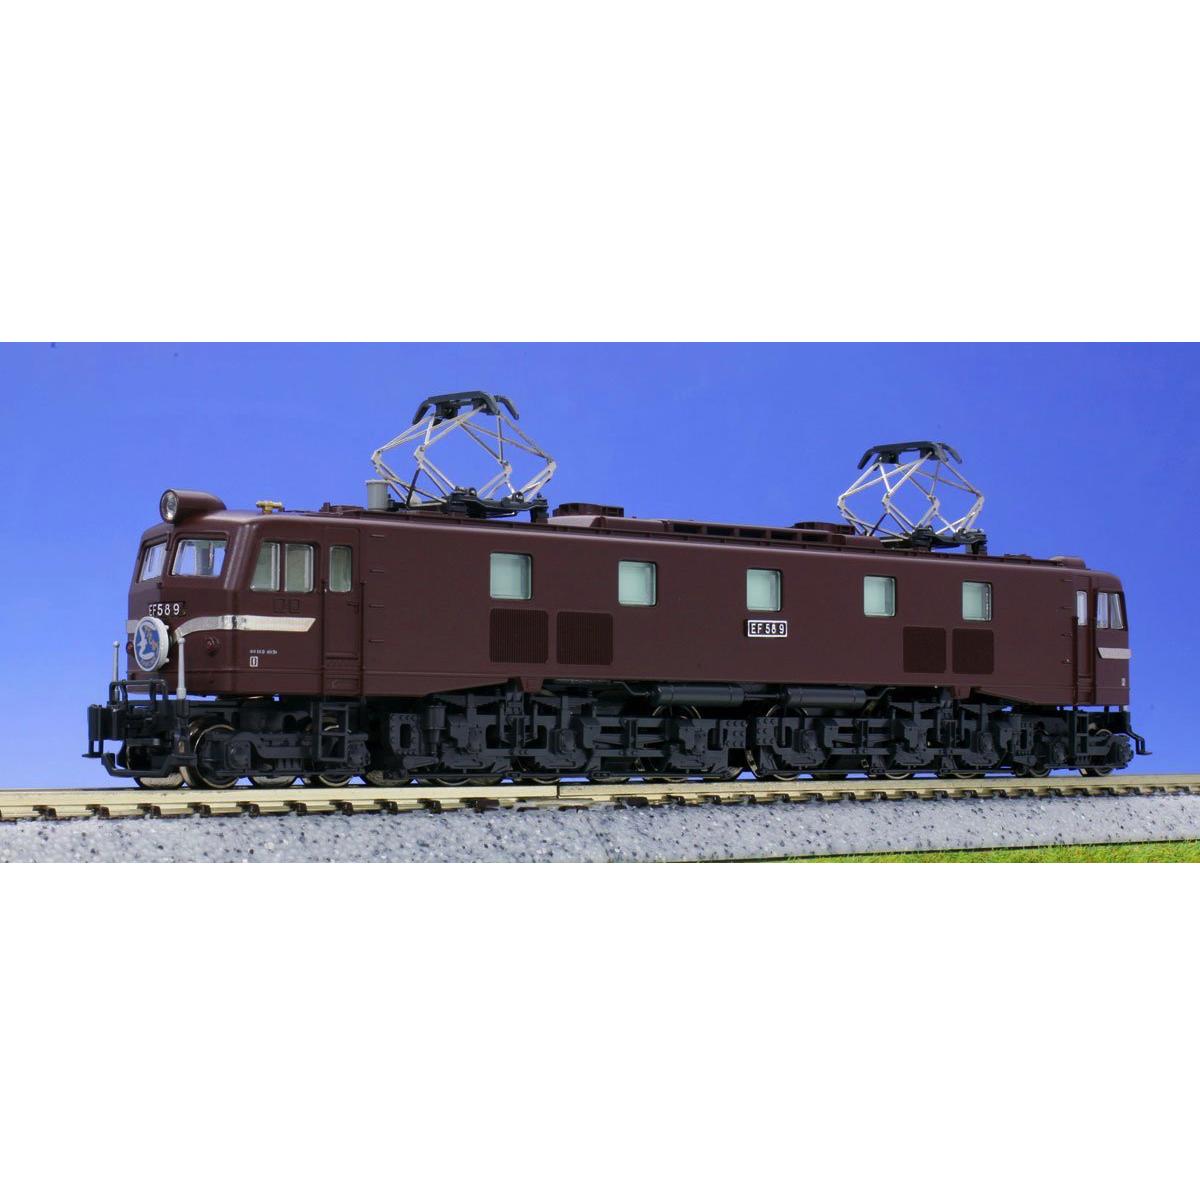 Kato 3055-1 Electric Locomotive EF58 marrone Early - N